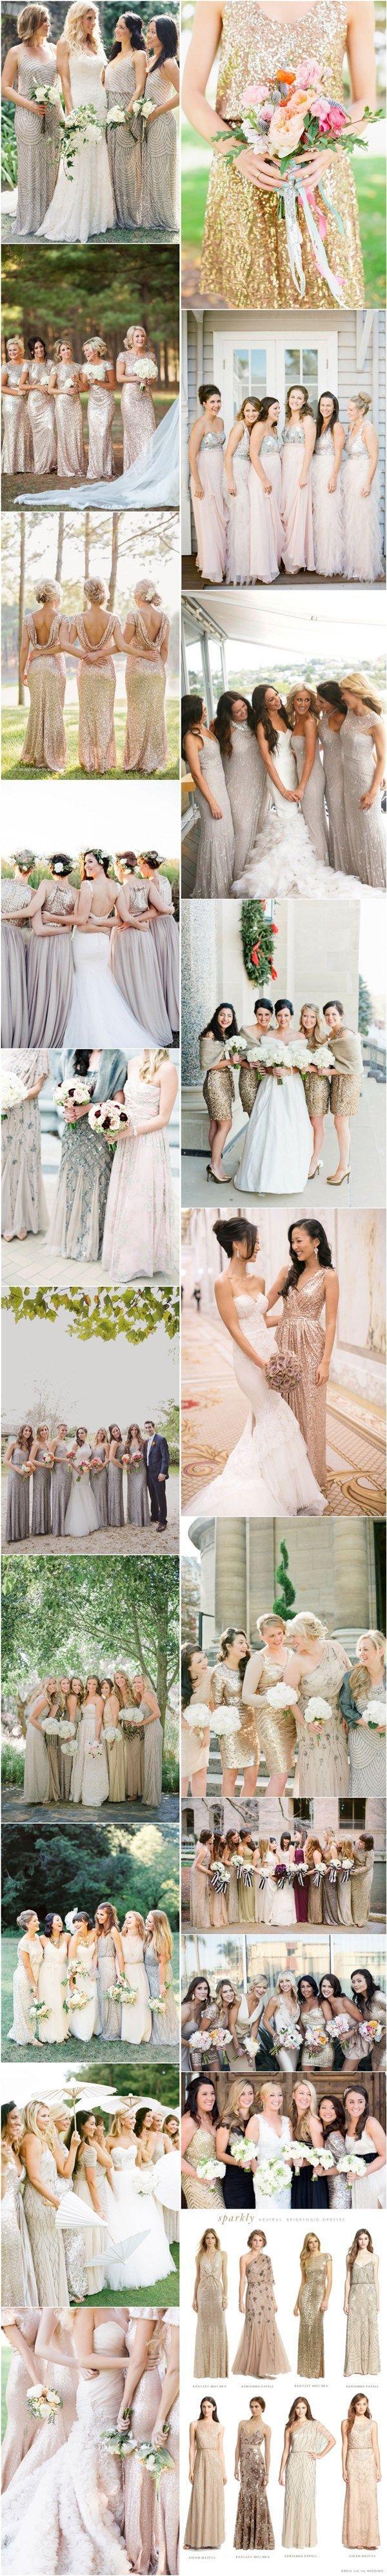 2015 Wedding Trends – Sequined and Metallic Bridesmaid Dresses | http://www.deerpearlflowers.com/2015-wedding-trends-sequined-metallic-bridesmaid-dresses/ #BridesmaidDresses